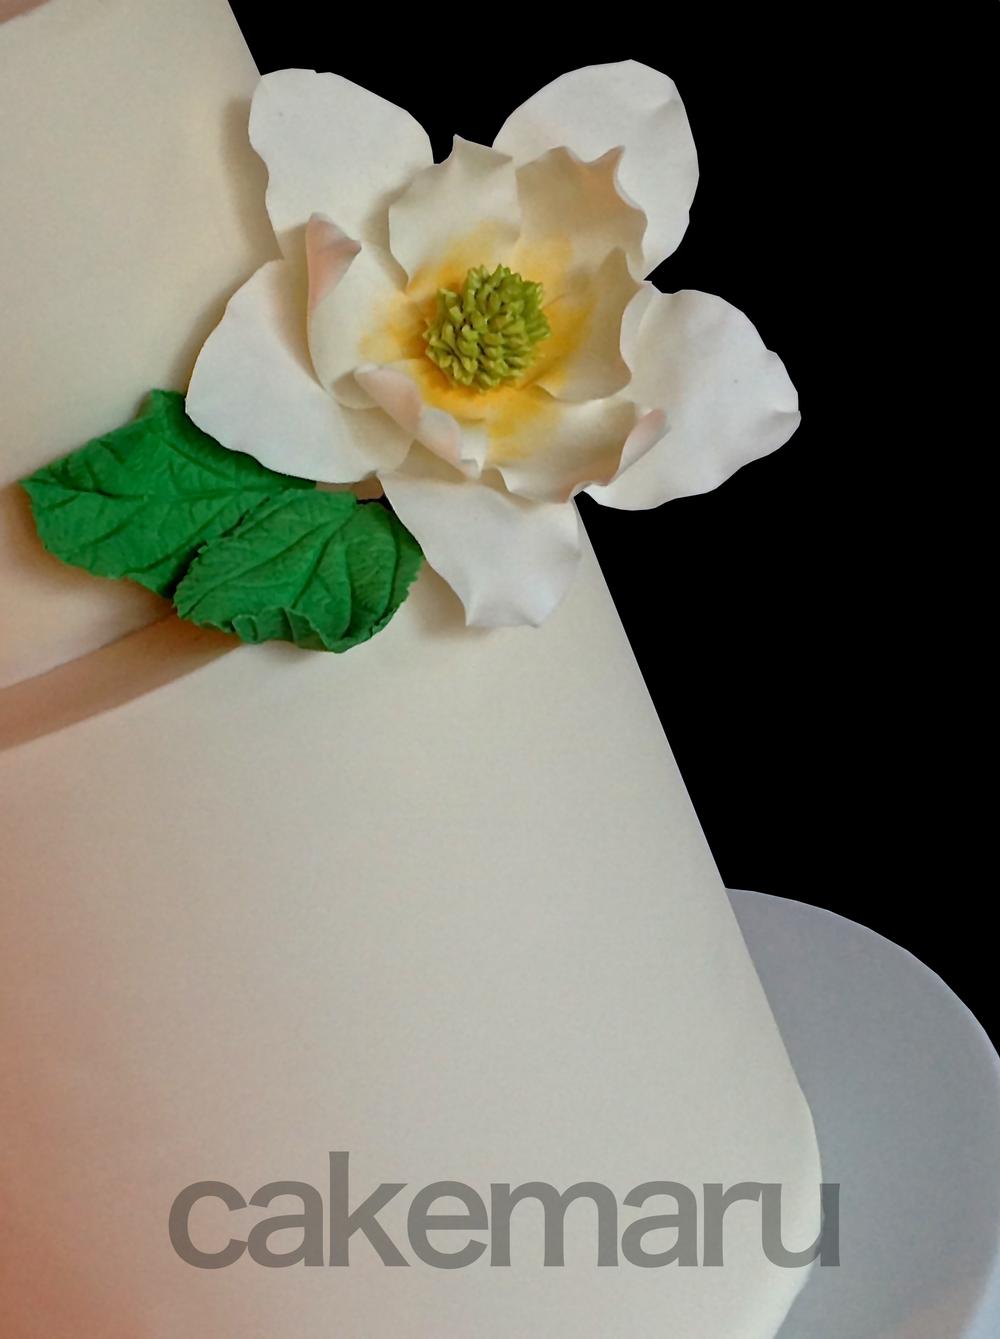 Magnolia cake with name.jpg